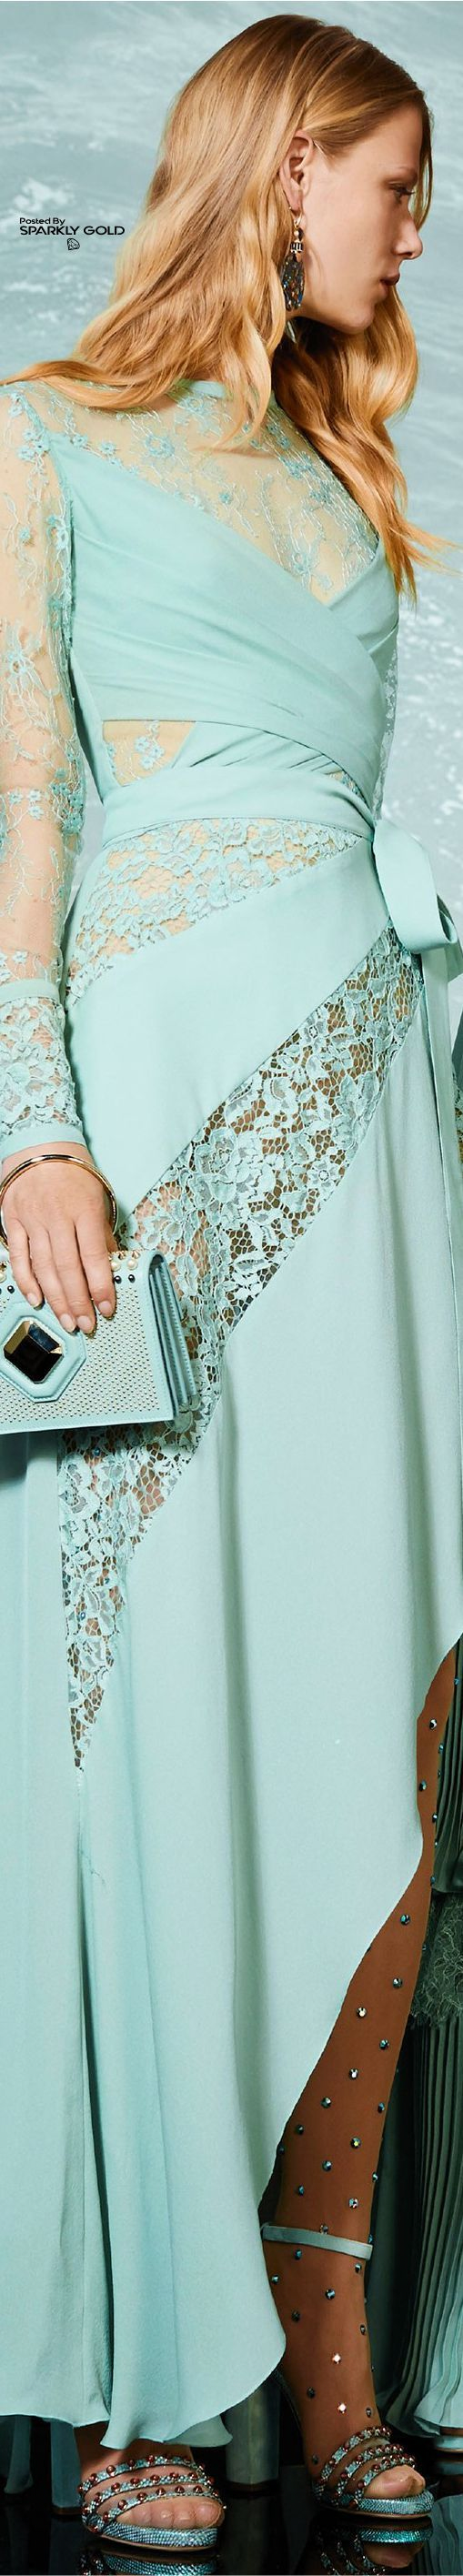 Elie Saab Resort 2018 Gorgeous Fashion